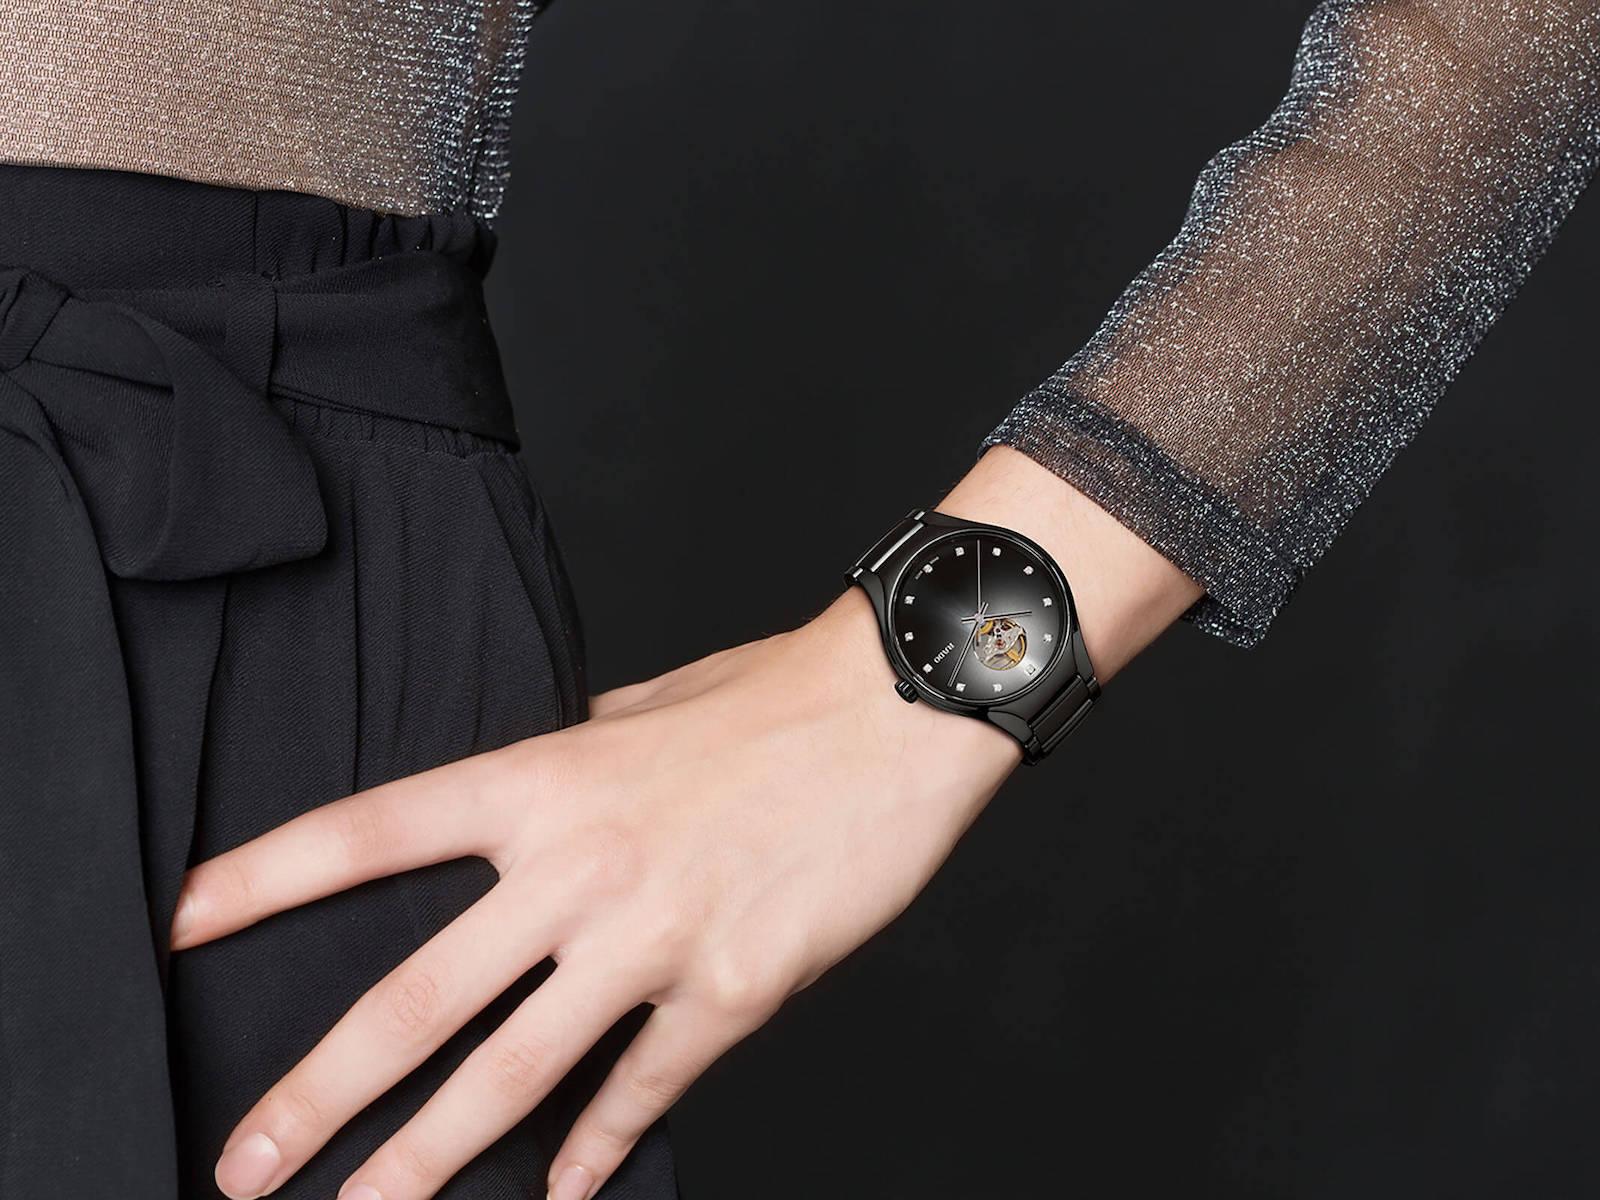 【RADO ラドー】True Secret Diamondsトゥルーシークレットダイヤモンズ(ブラック)/正規輸入品